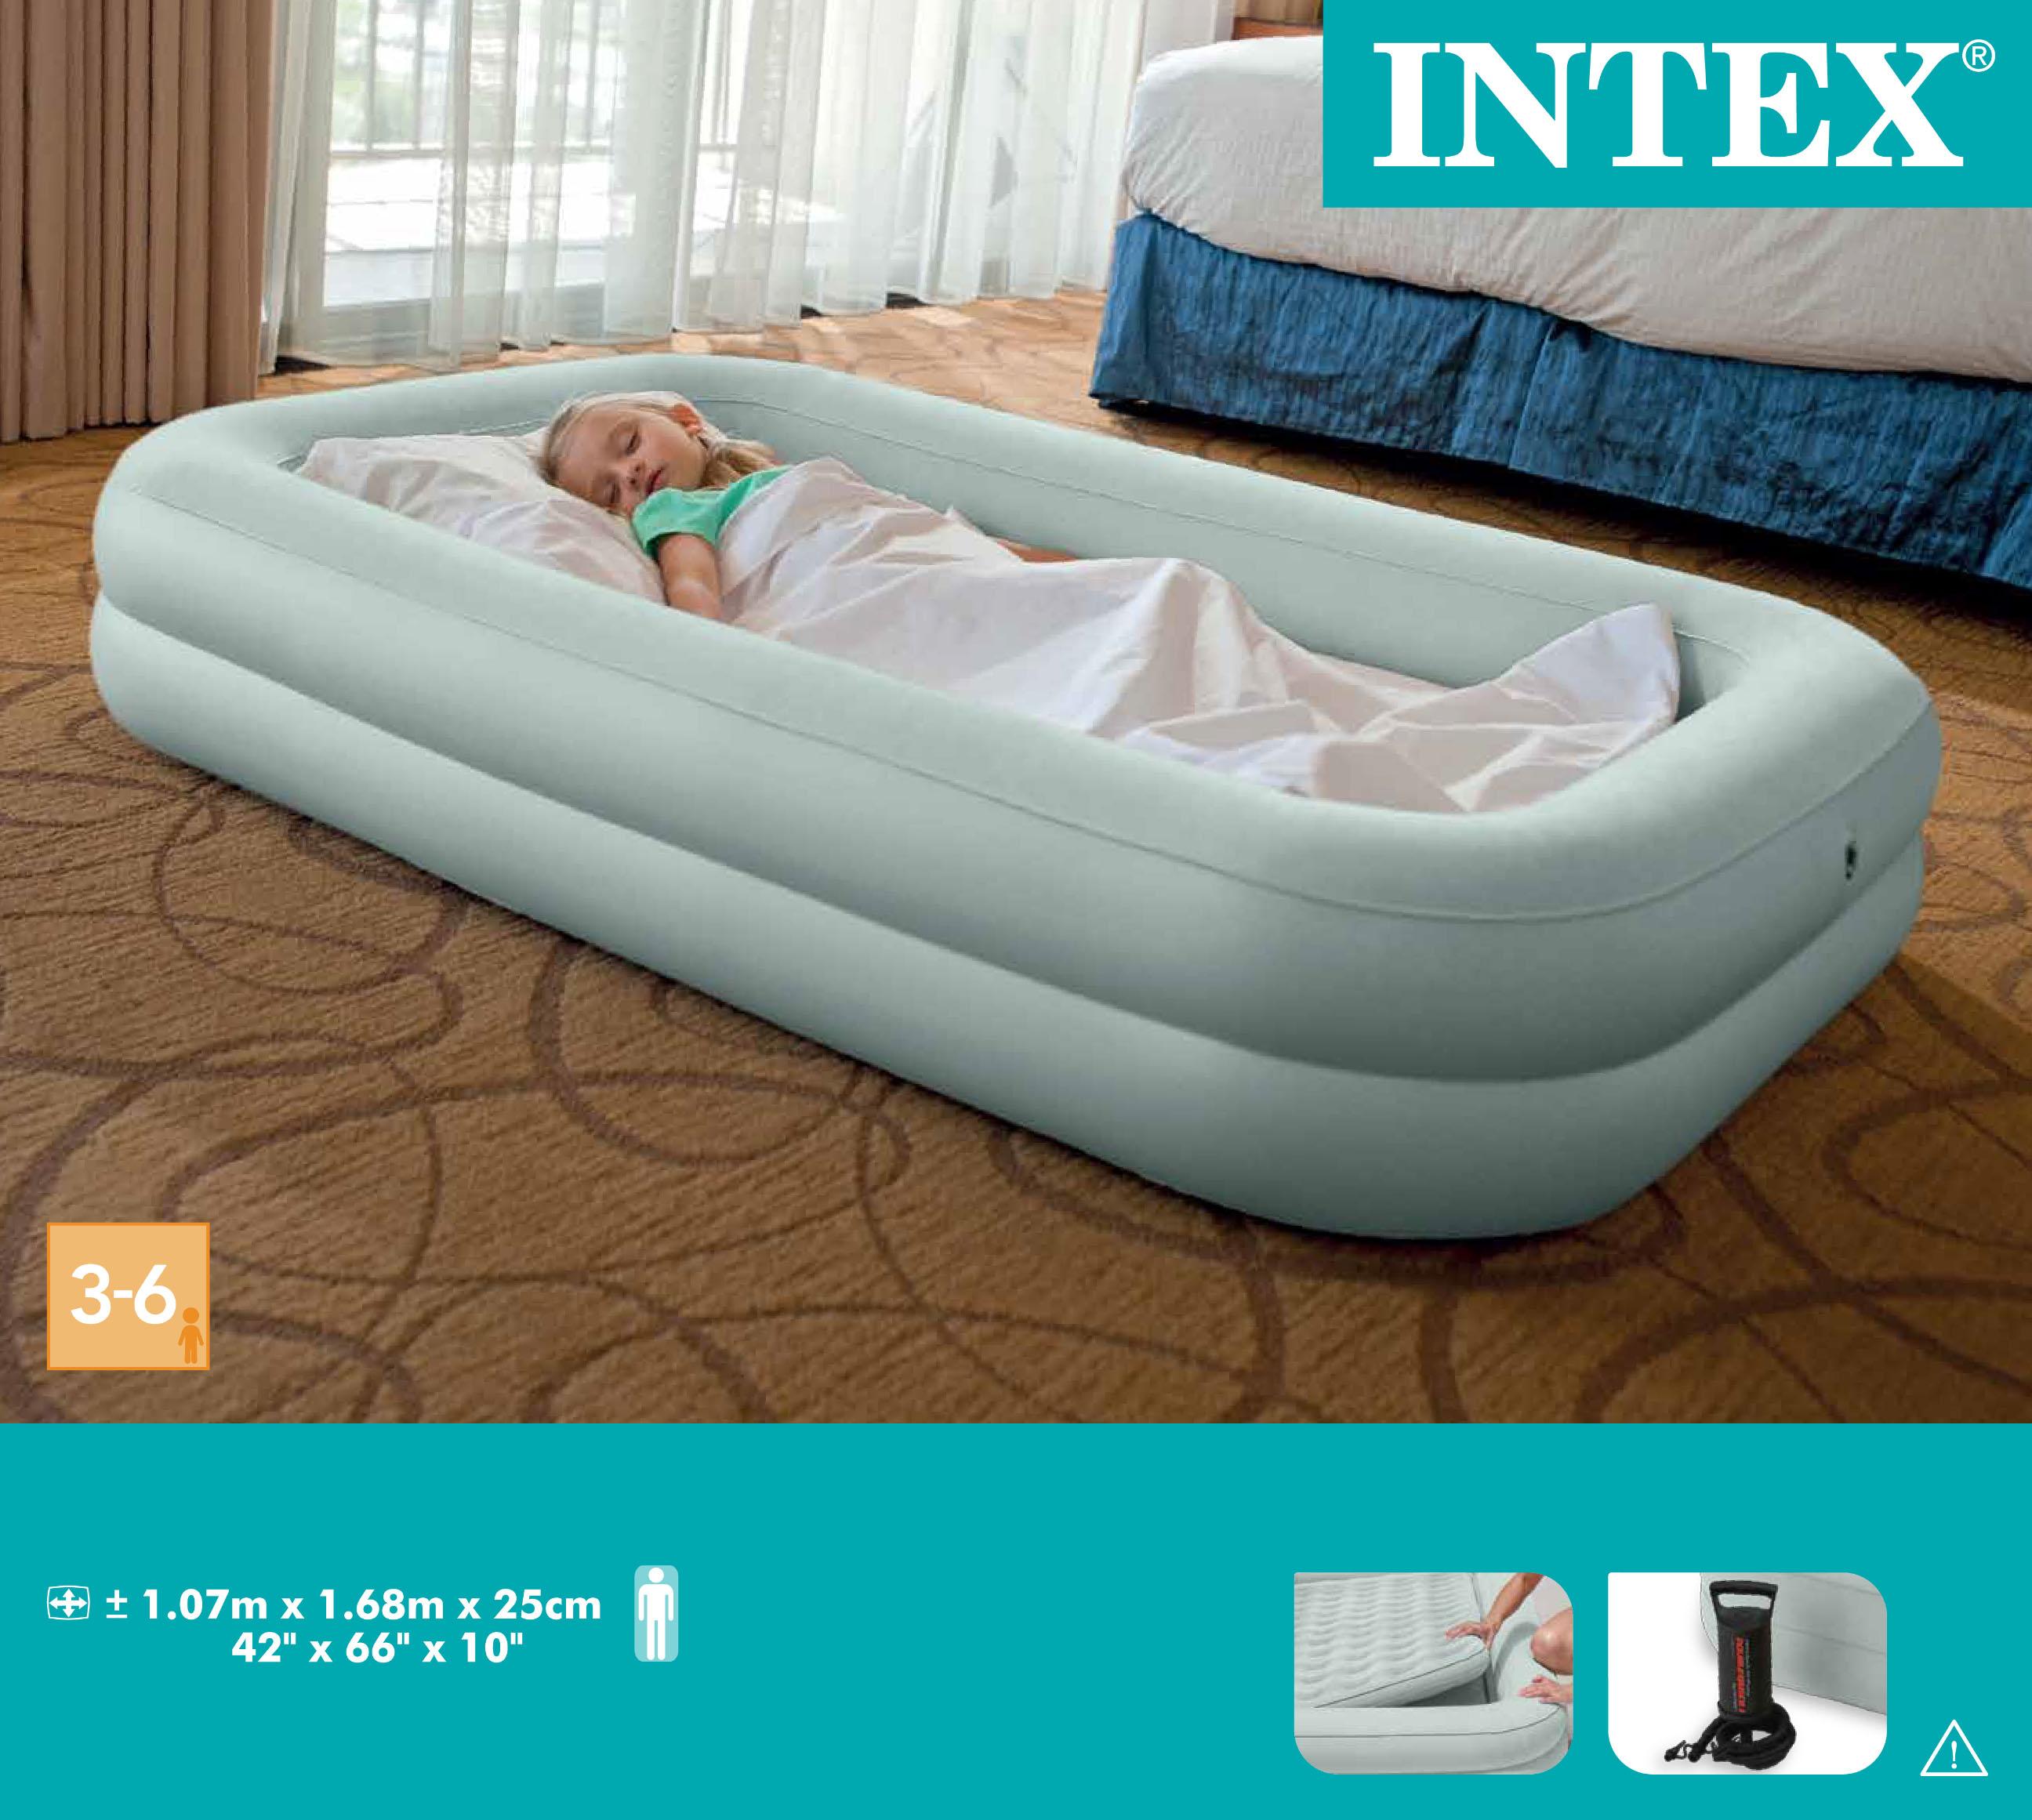 Gästebett INTEX Reisebett Kinderbett 107x168x25cm Luftbett mit Pumpe Gästebett Bett Camping-Schlafausrüstung